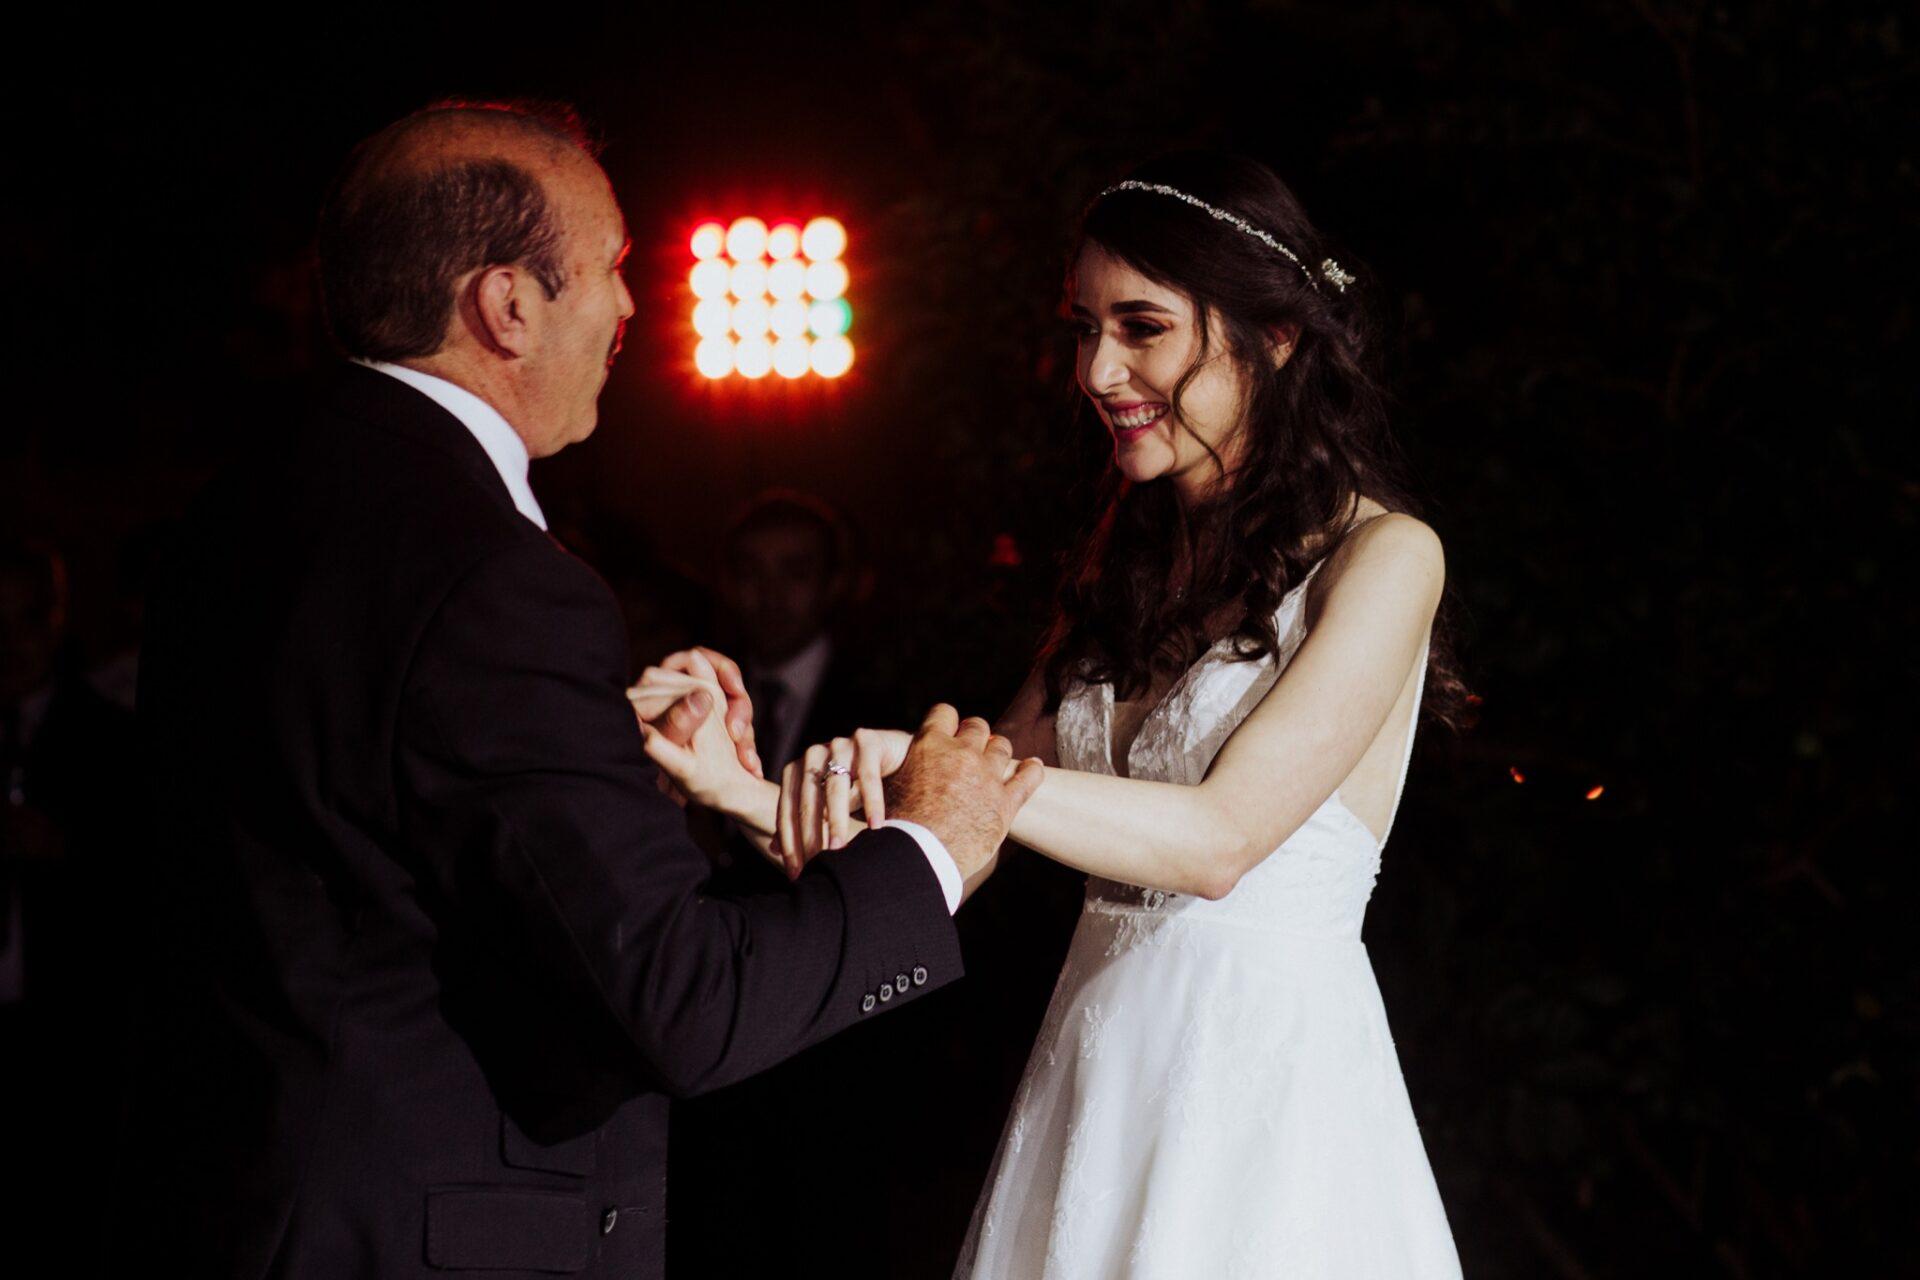 javier_noriega_fotografo_bodas_teul_zacatecas_wedding_photographer37